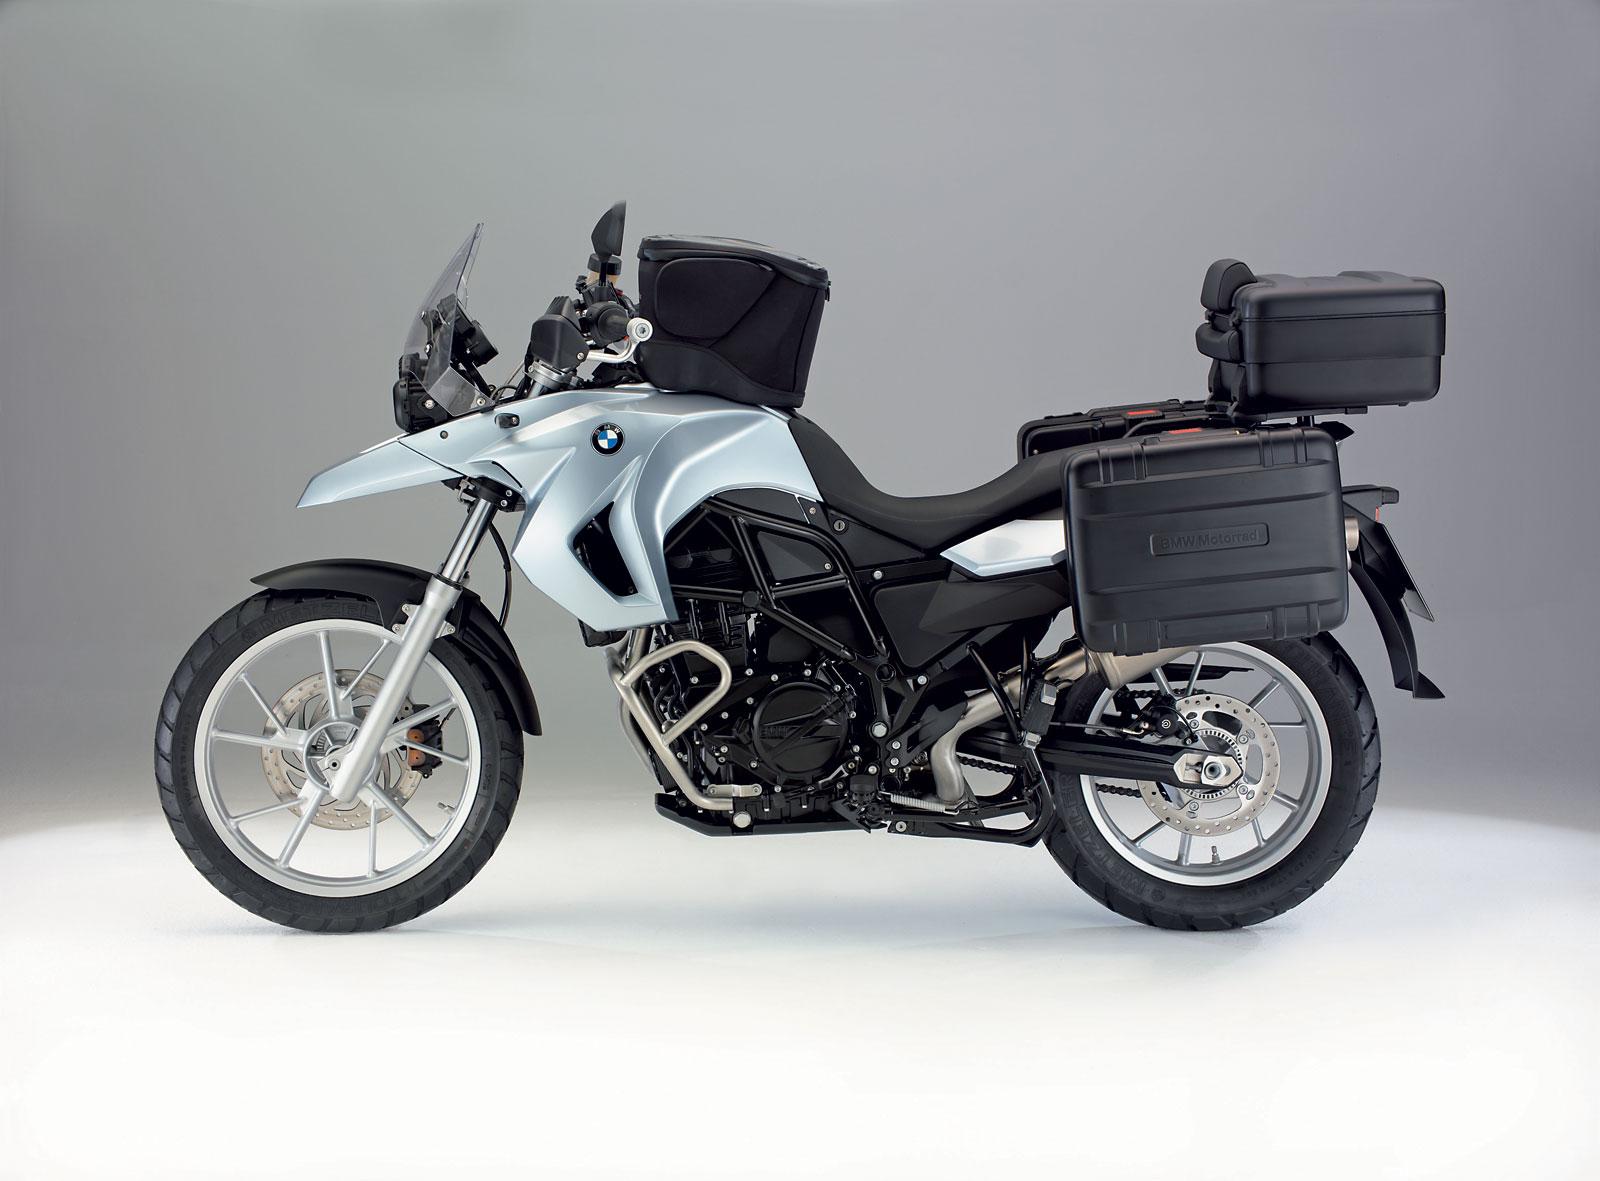 motorcycle bmw type f650gs | honda motorcycles trend mode motorbike